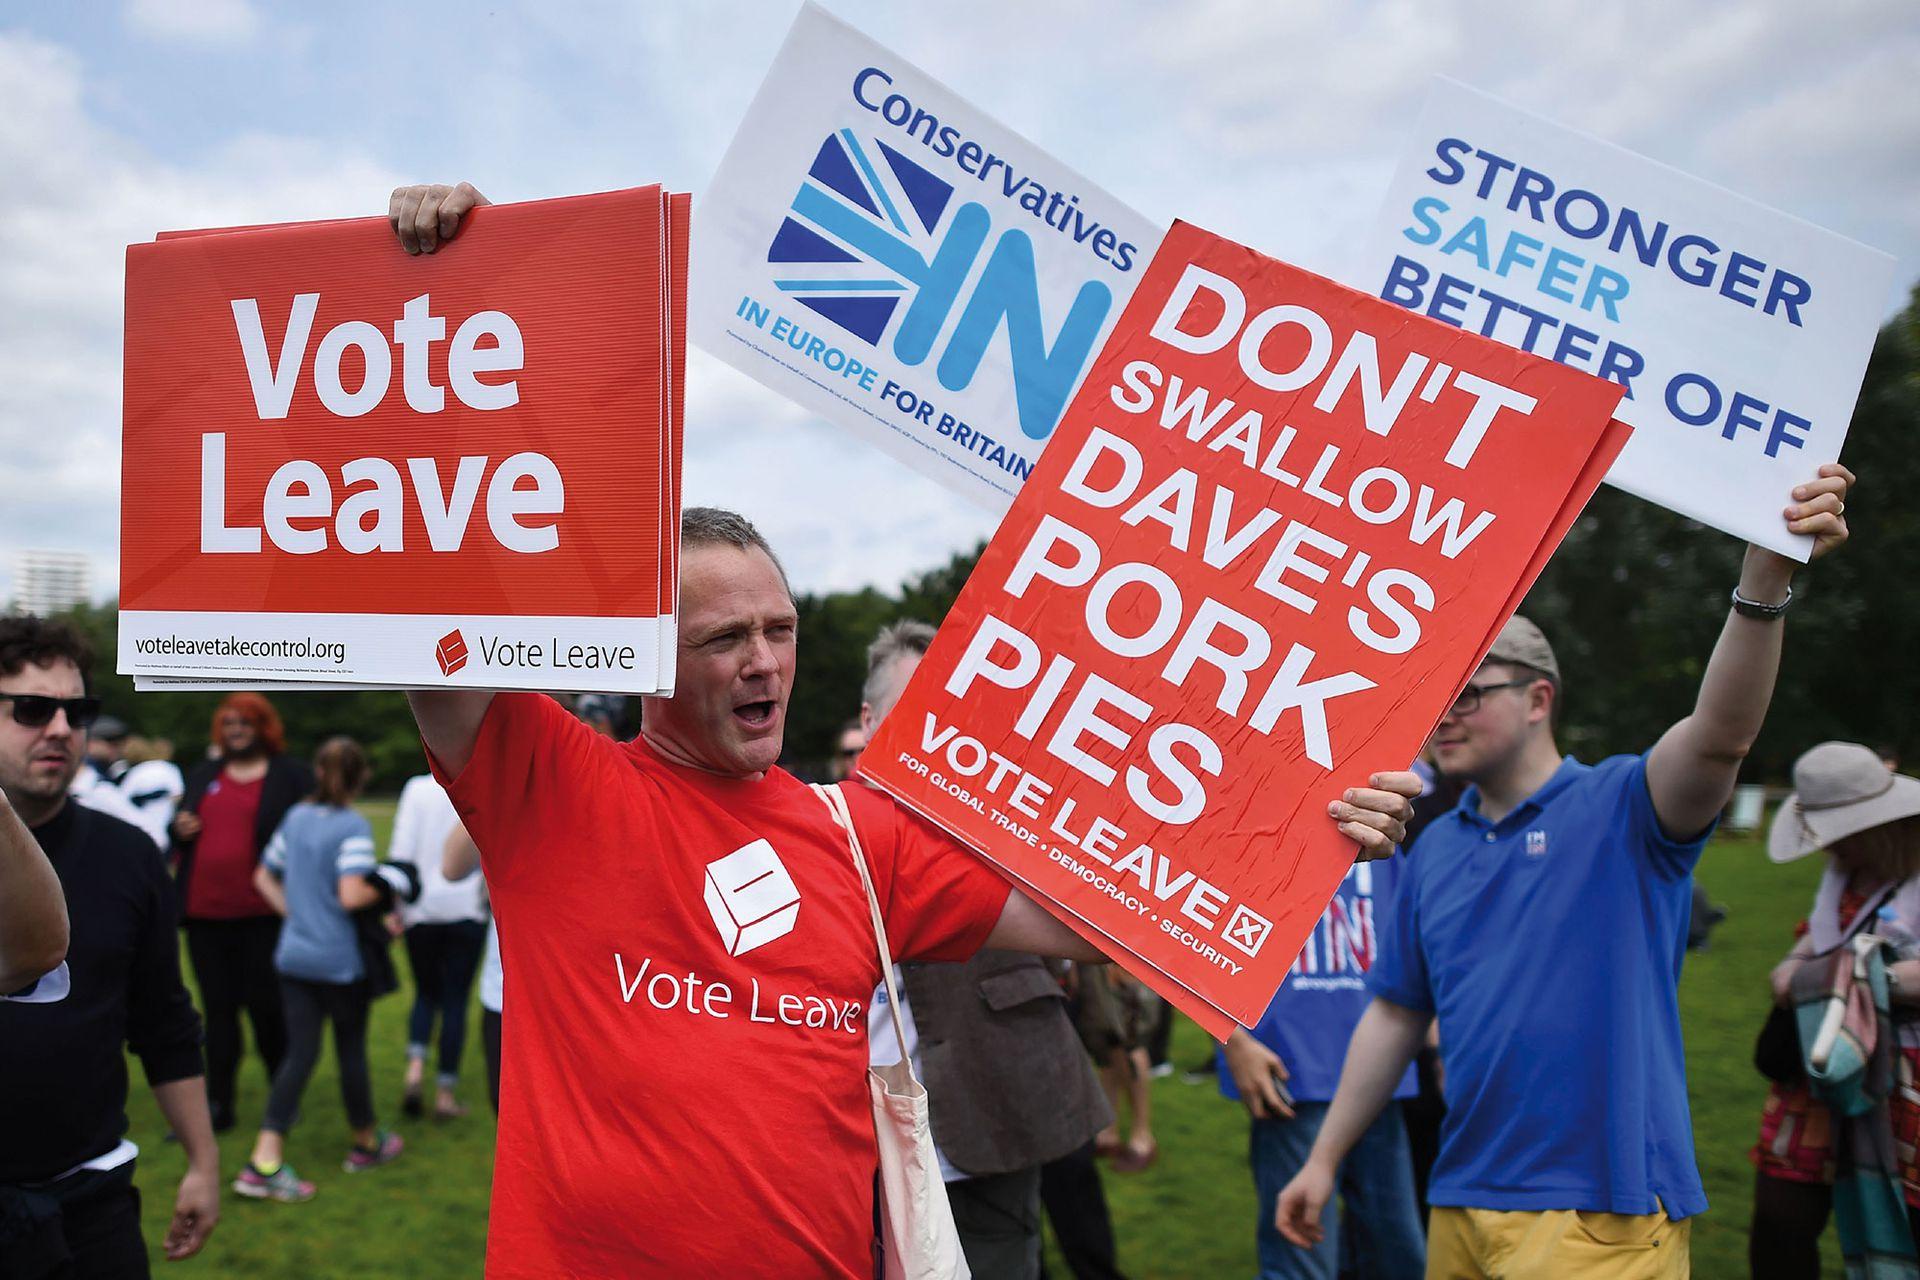 El lema del Brexit: Vote Leave (Vote irse).